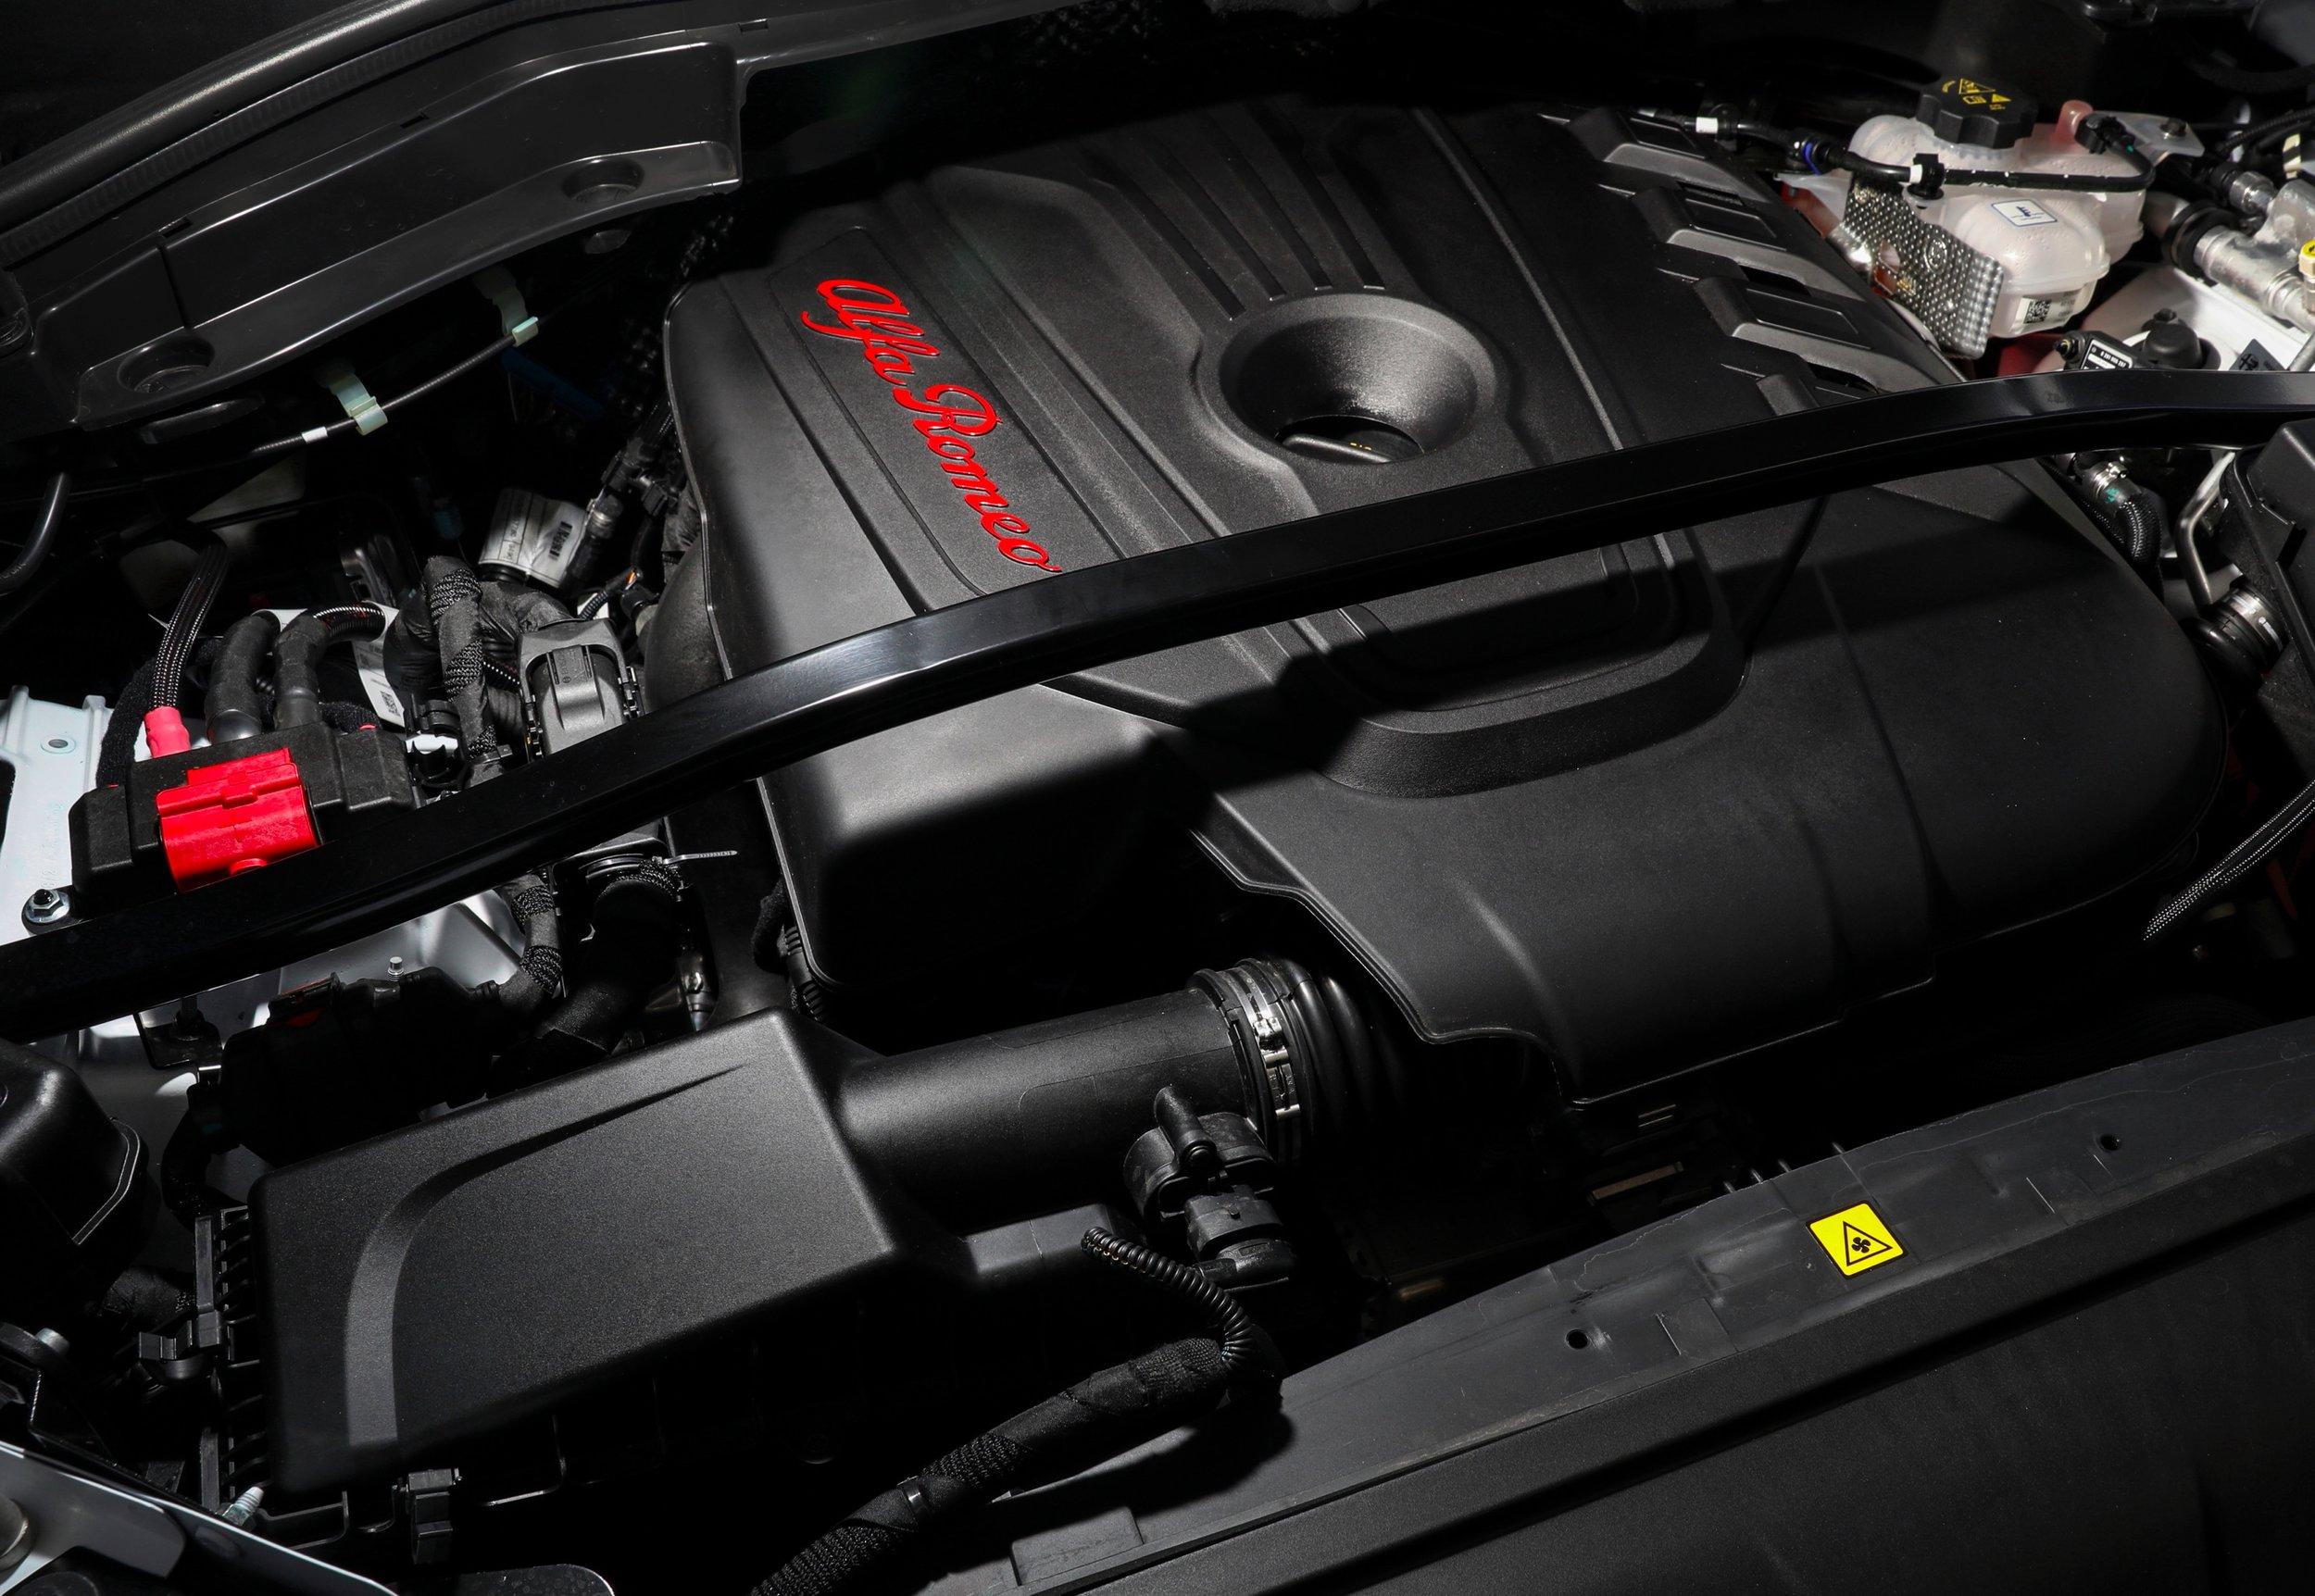 2018 Alfa Romeo Stelvio_Engine_0004.JPG